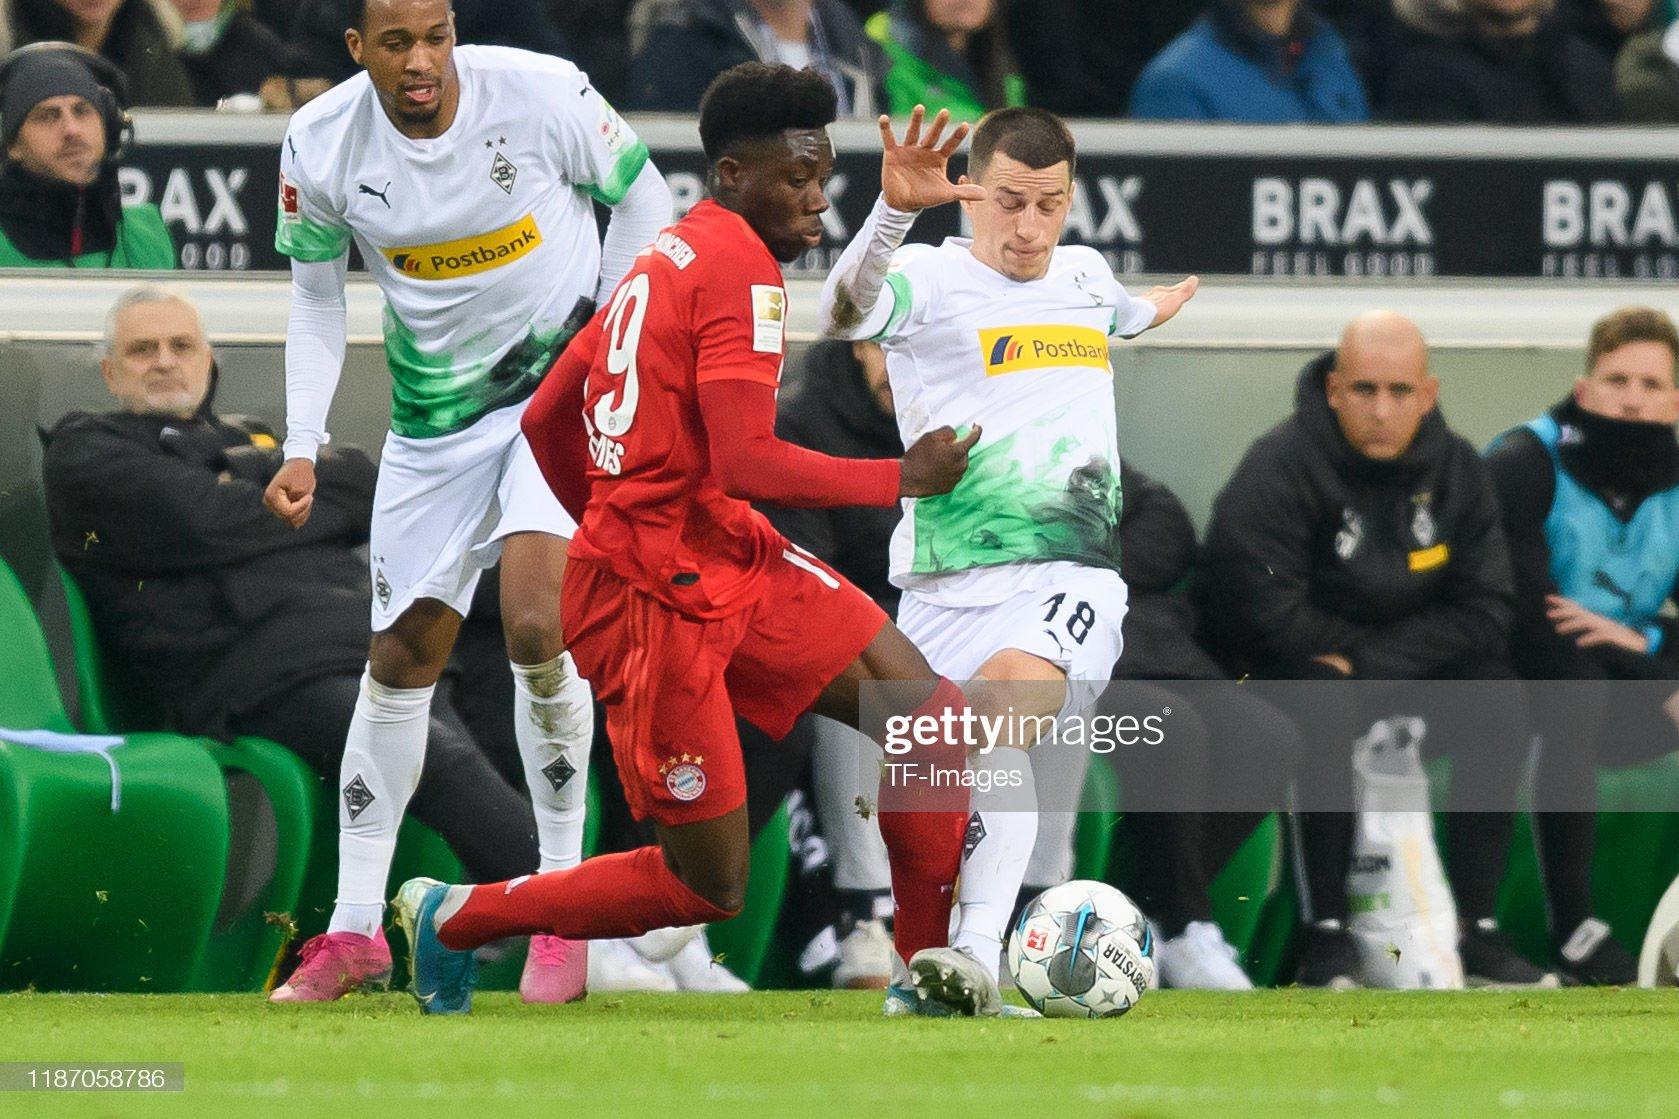 Bayern Munich vs Monchengladbach Preview, prediction and odds